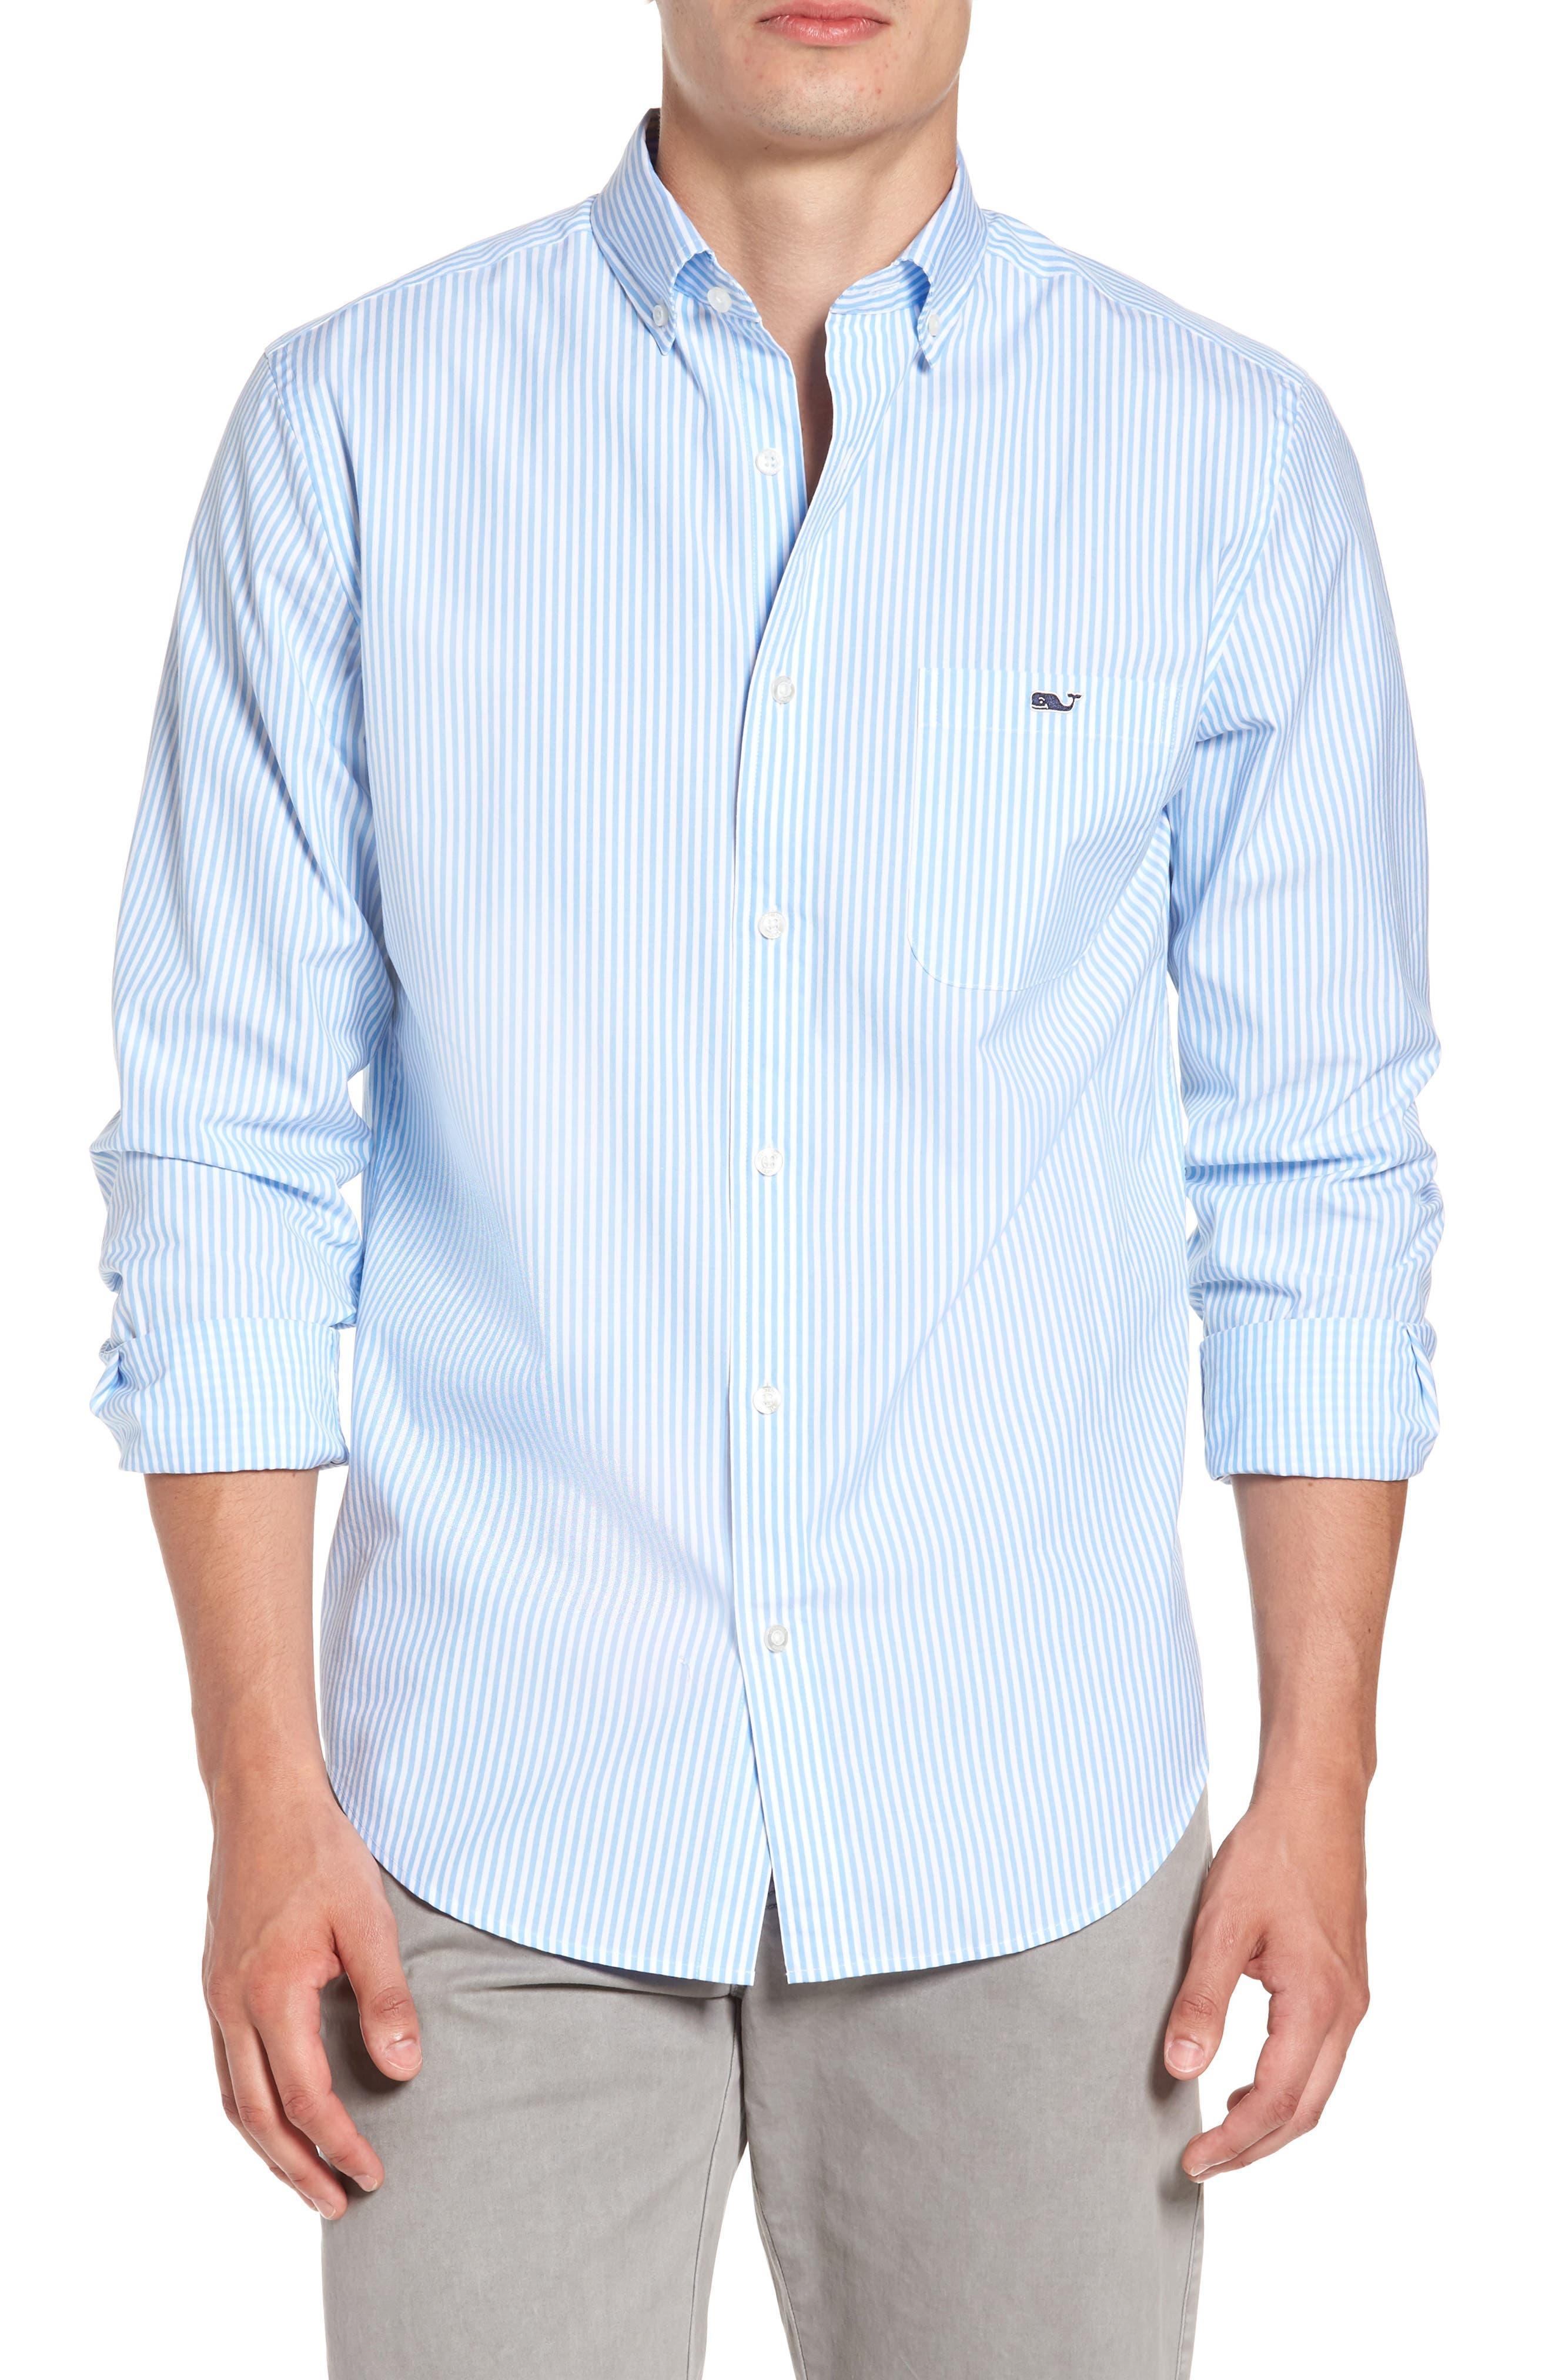 Main Image - vineyard vines Swordfish Stripe Tucker Sport Shirt